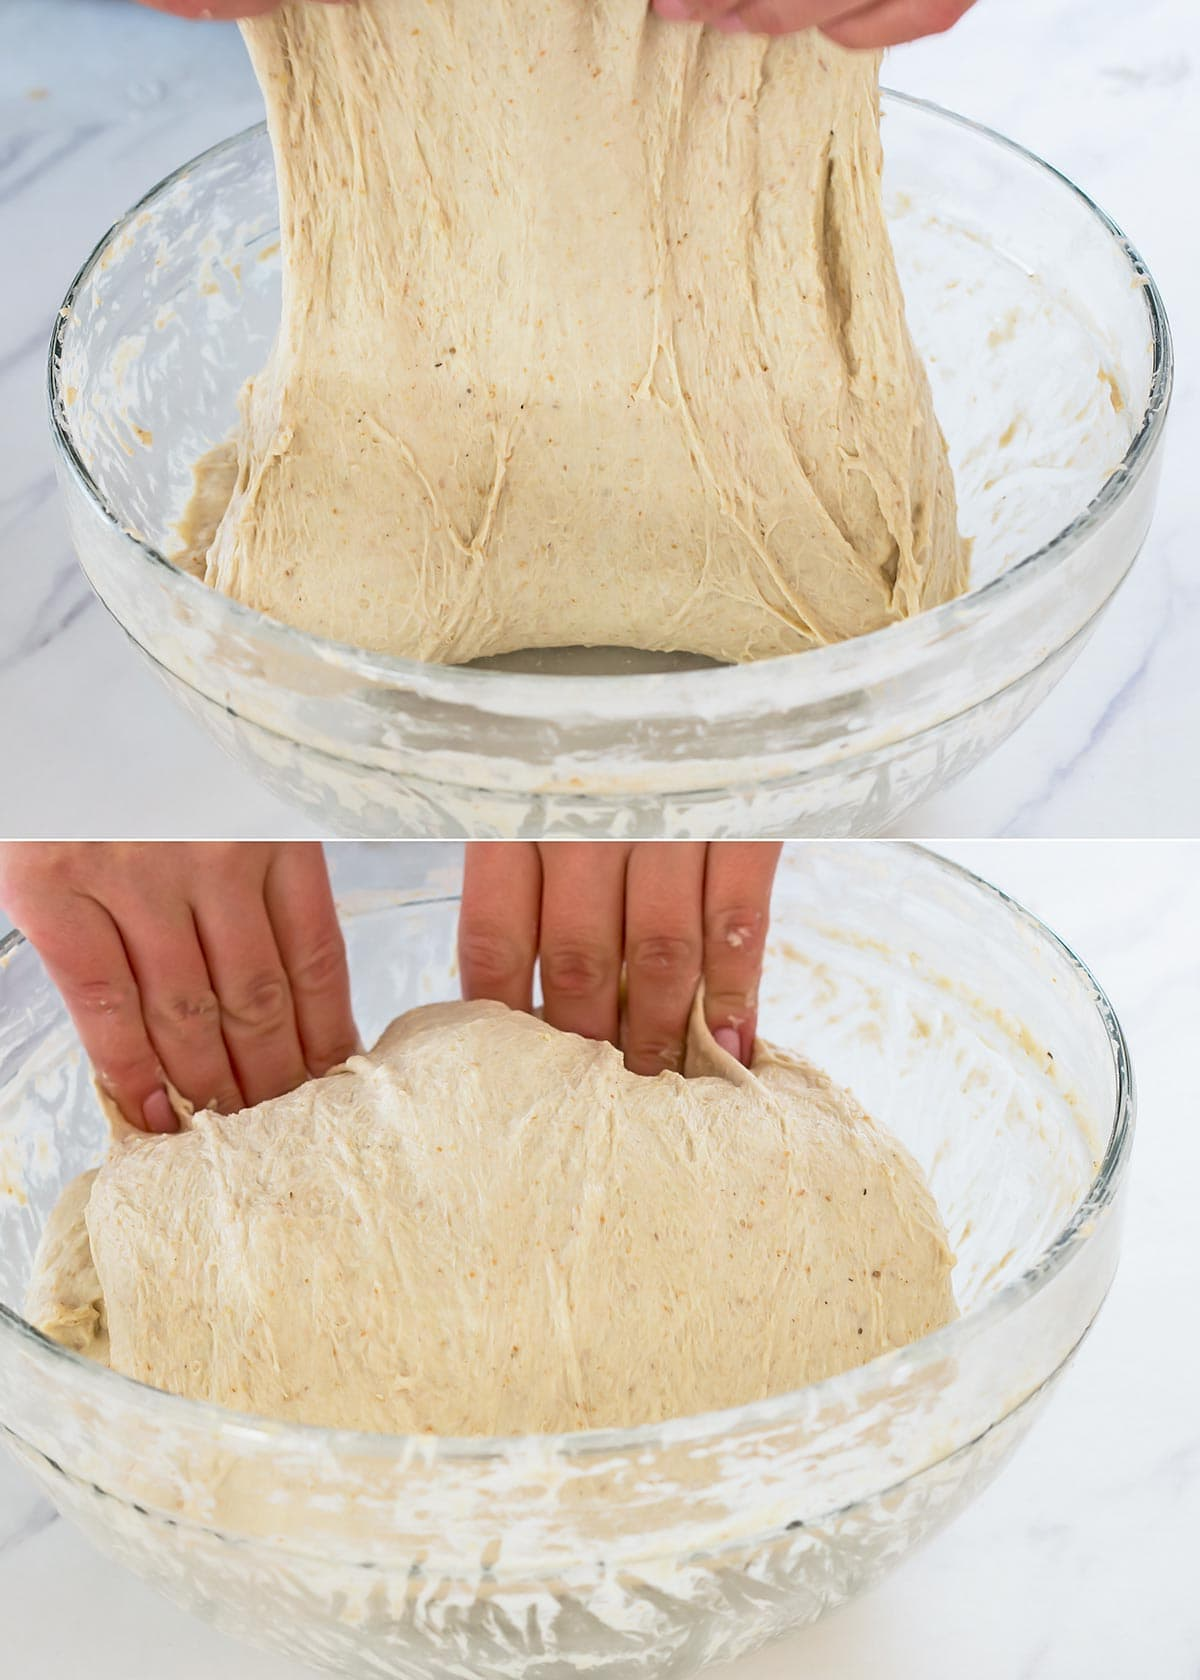 Stretching and folding sourdough during bulk fermentation